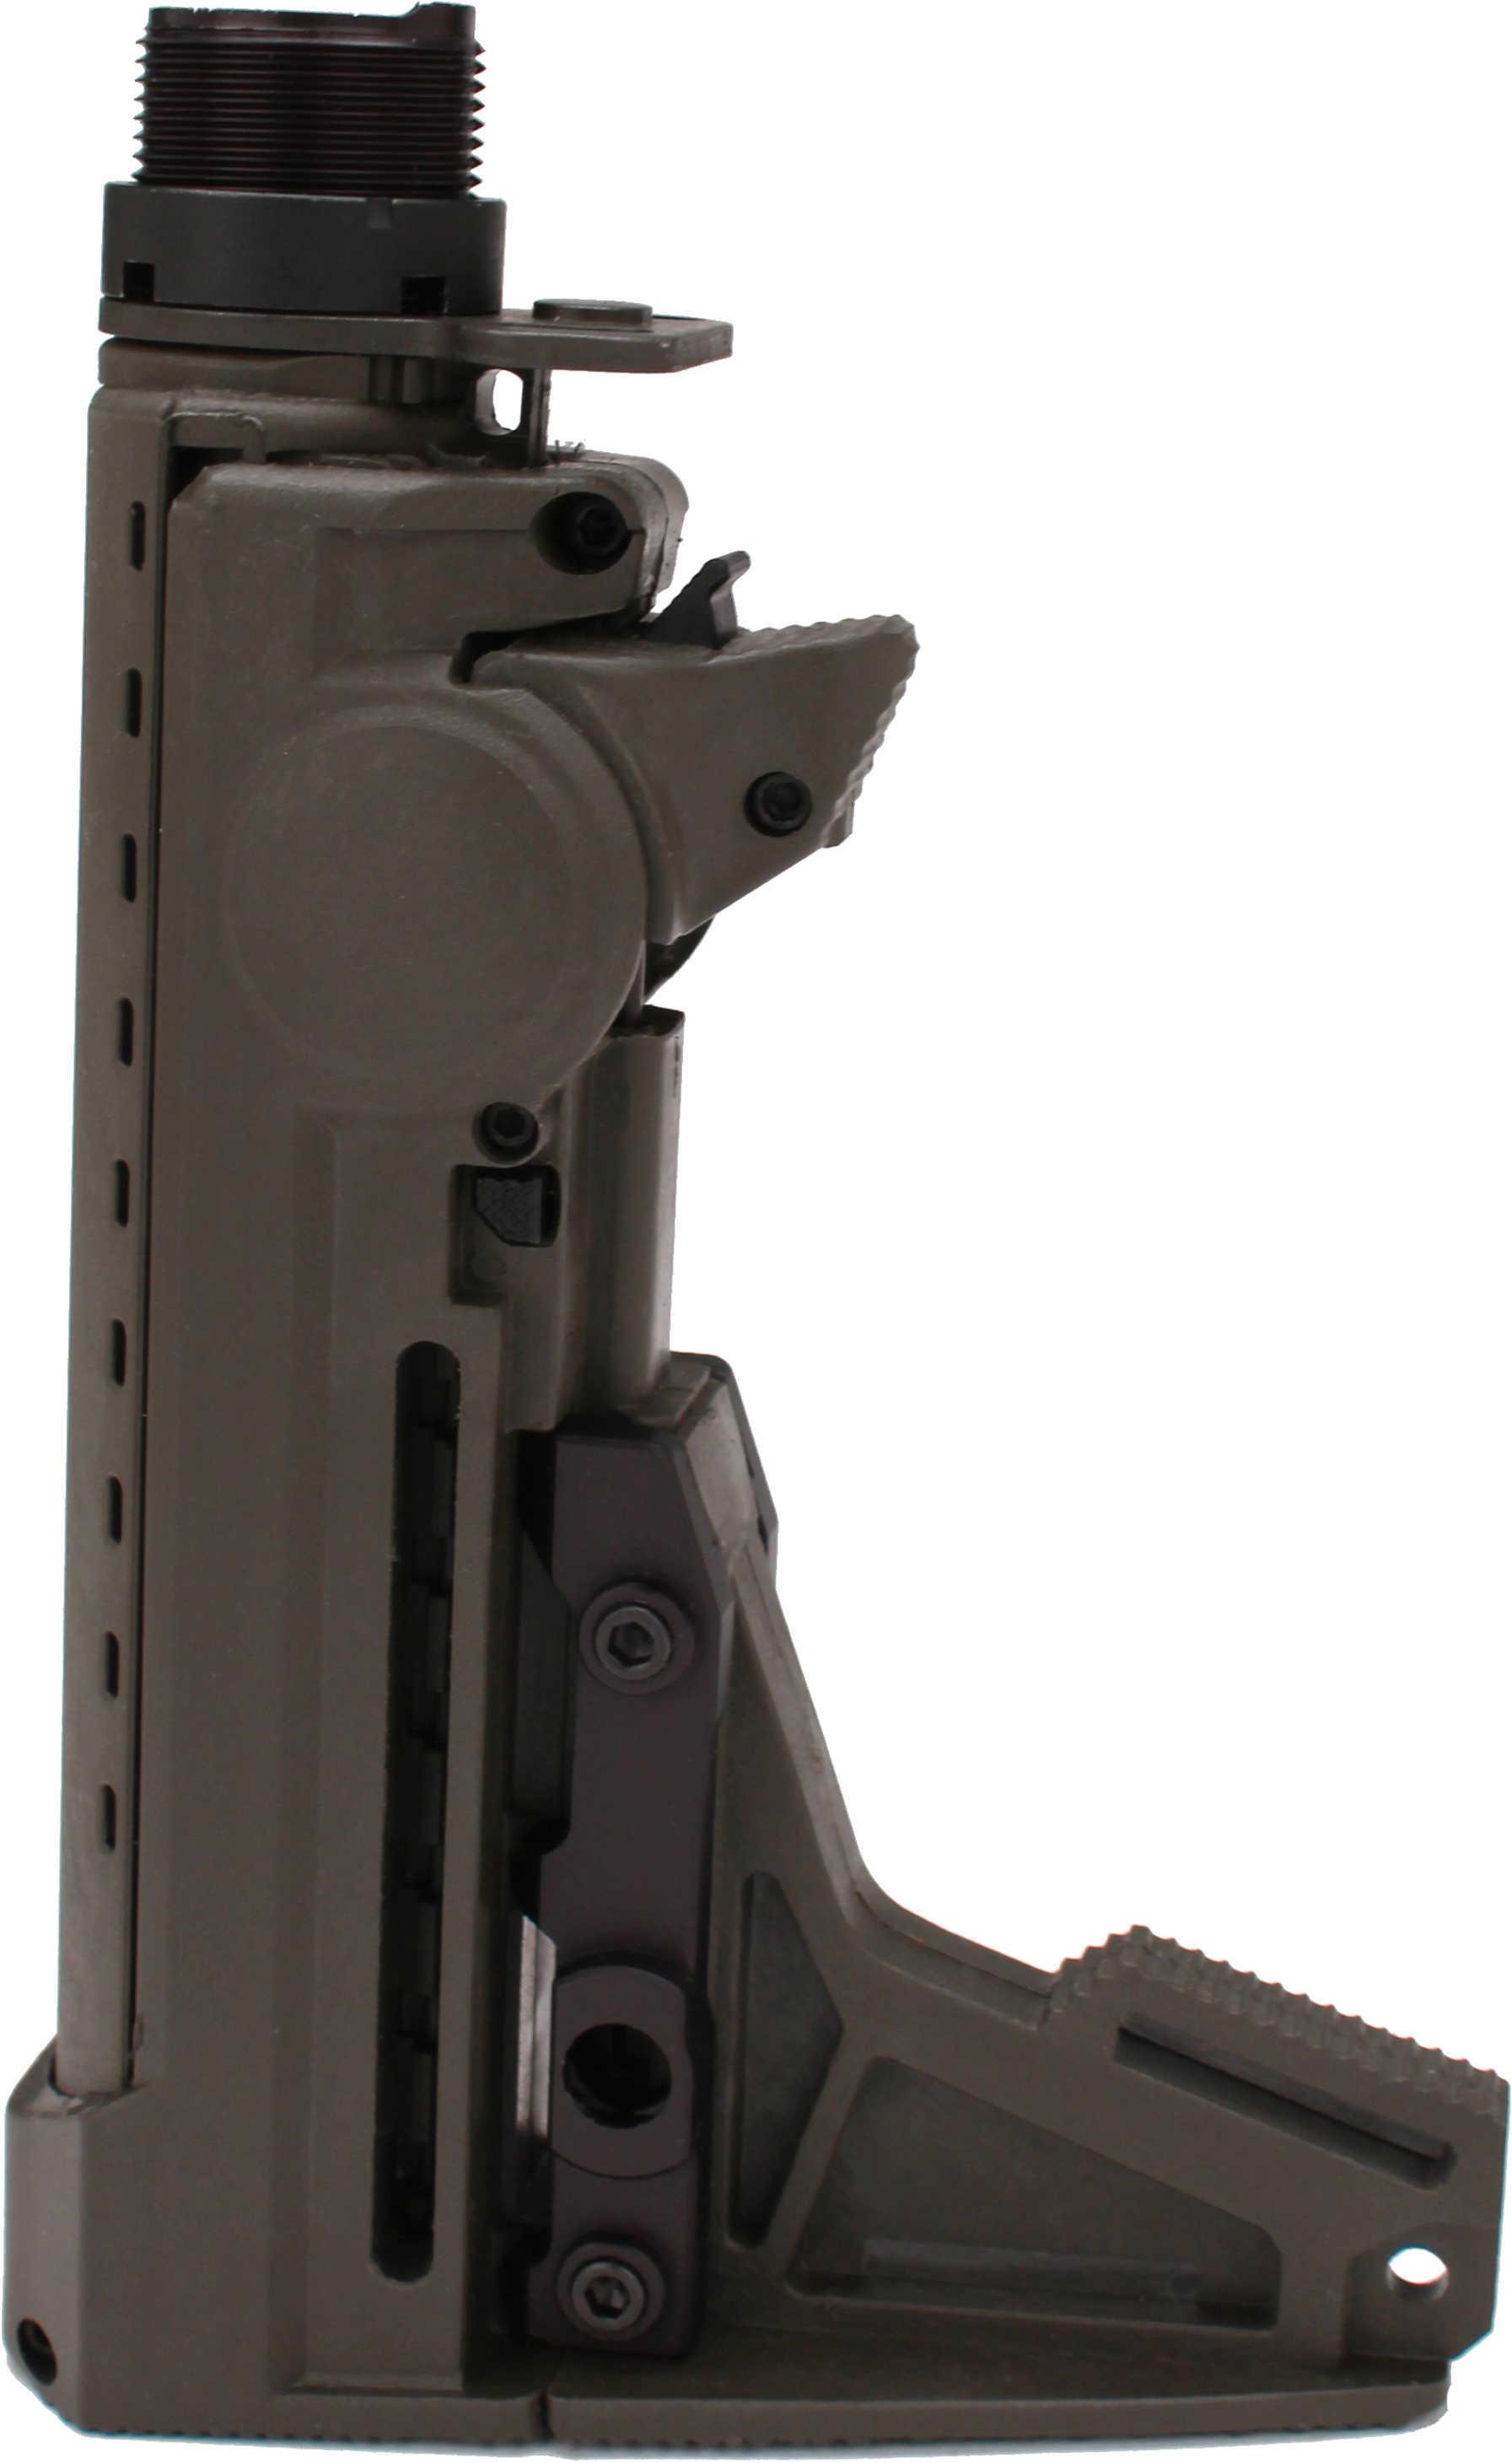 F93-AR-15 /M16 Adjustable ProStock Assembly Olive Drab Md: 4925-OD